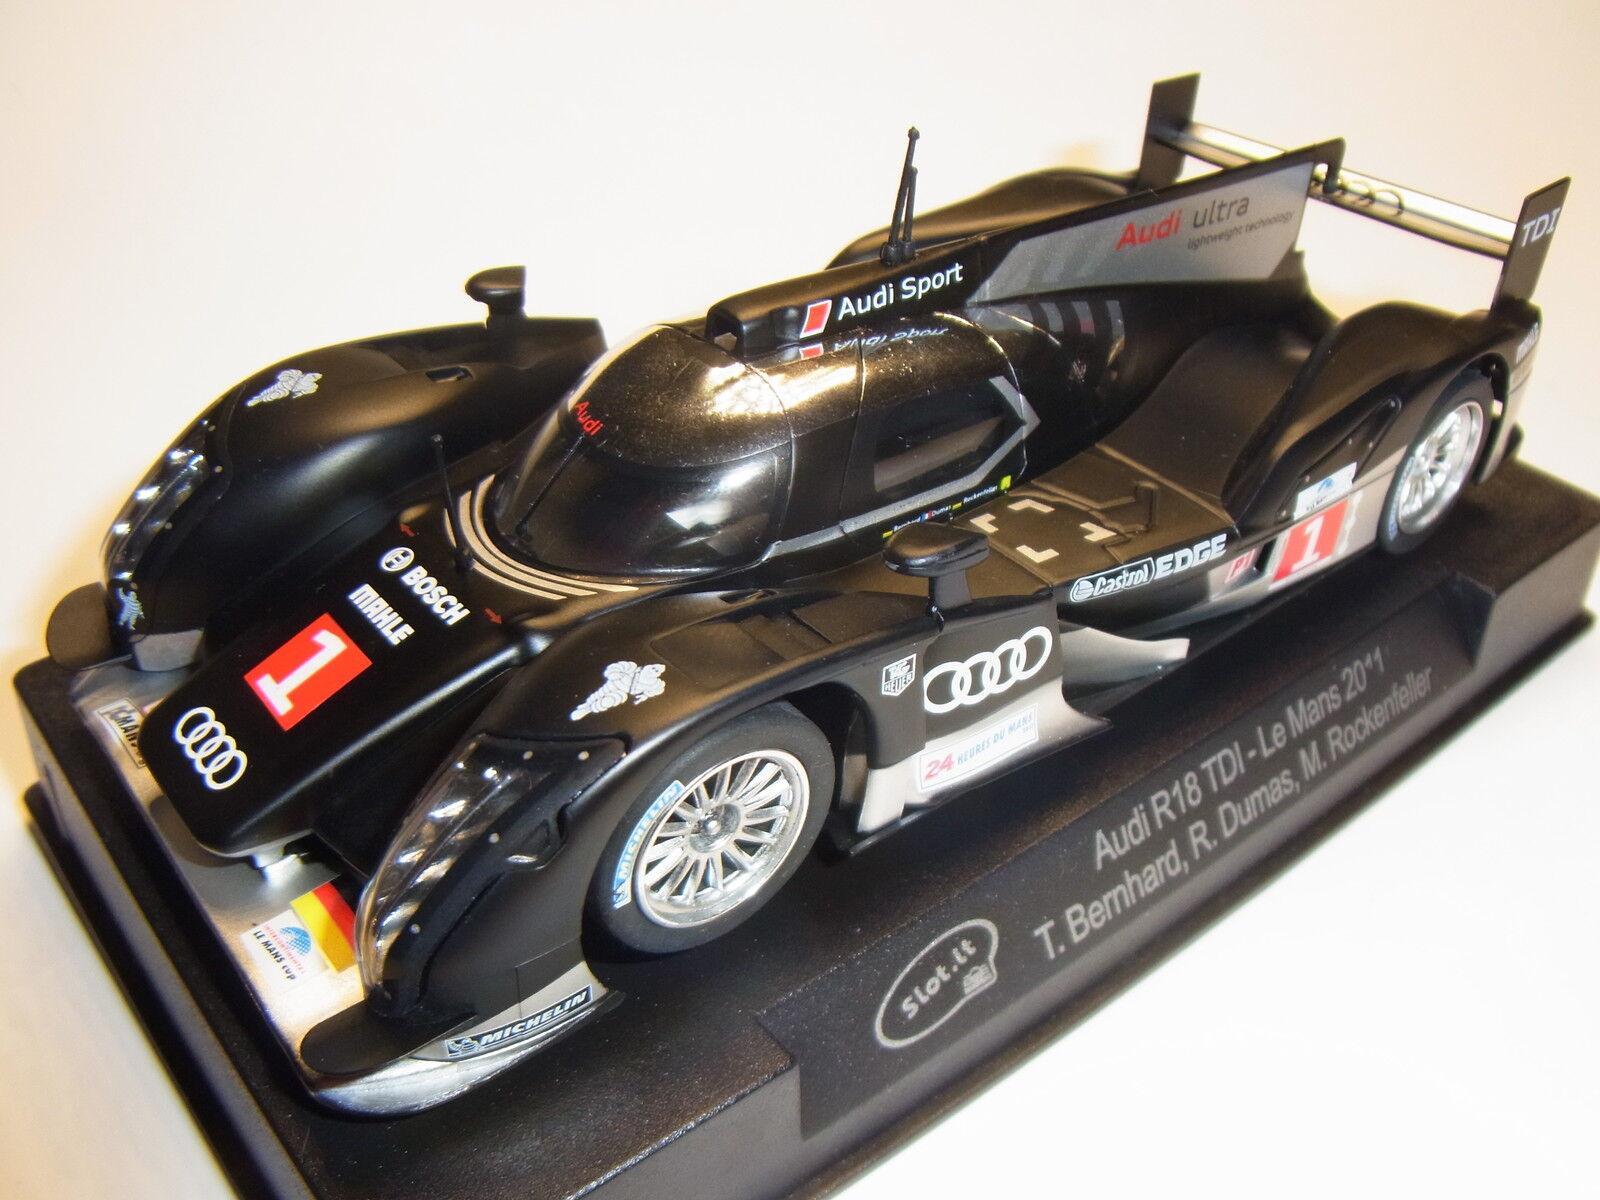 Slot  Audi R18 Le Mans 2011  1 für Autorennbahn 1 32